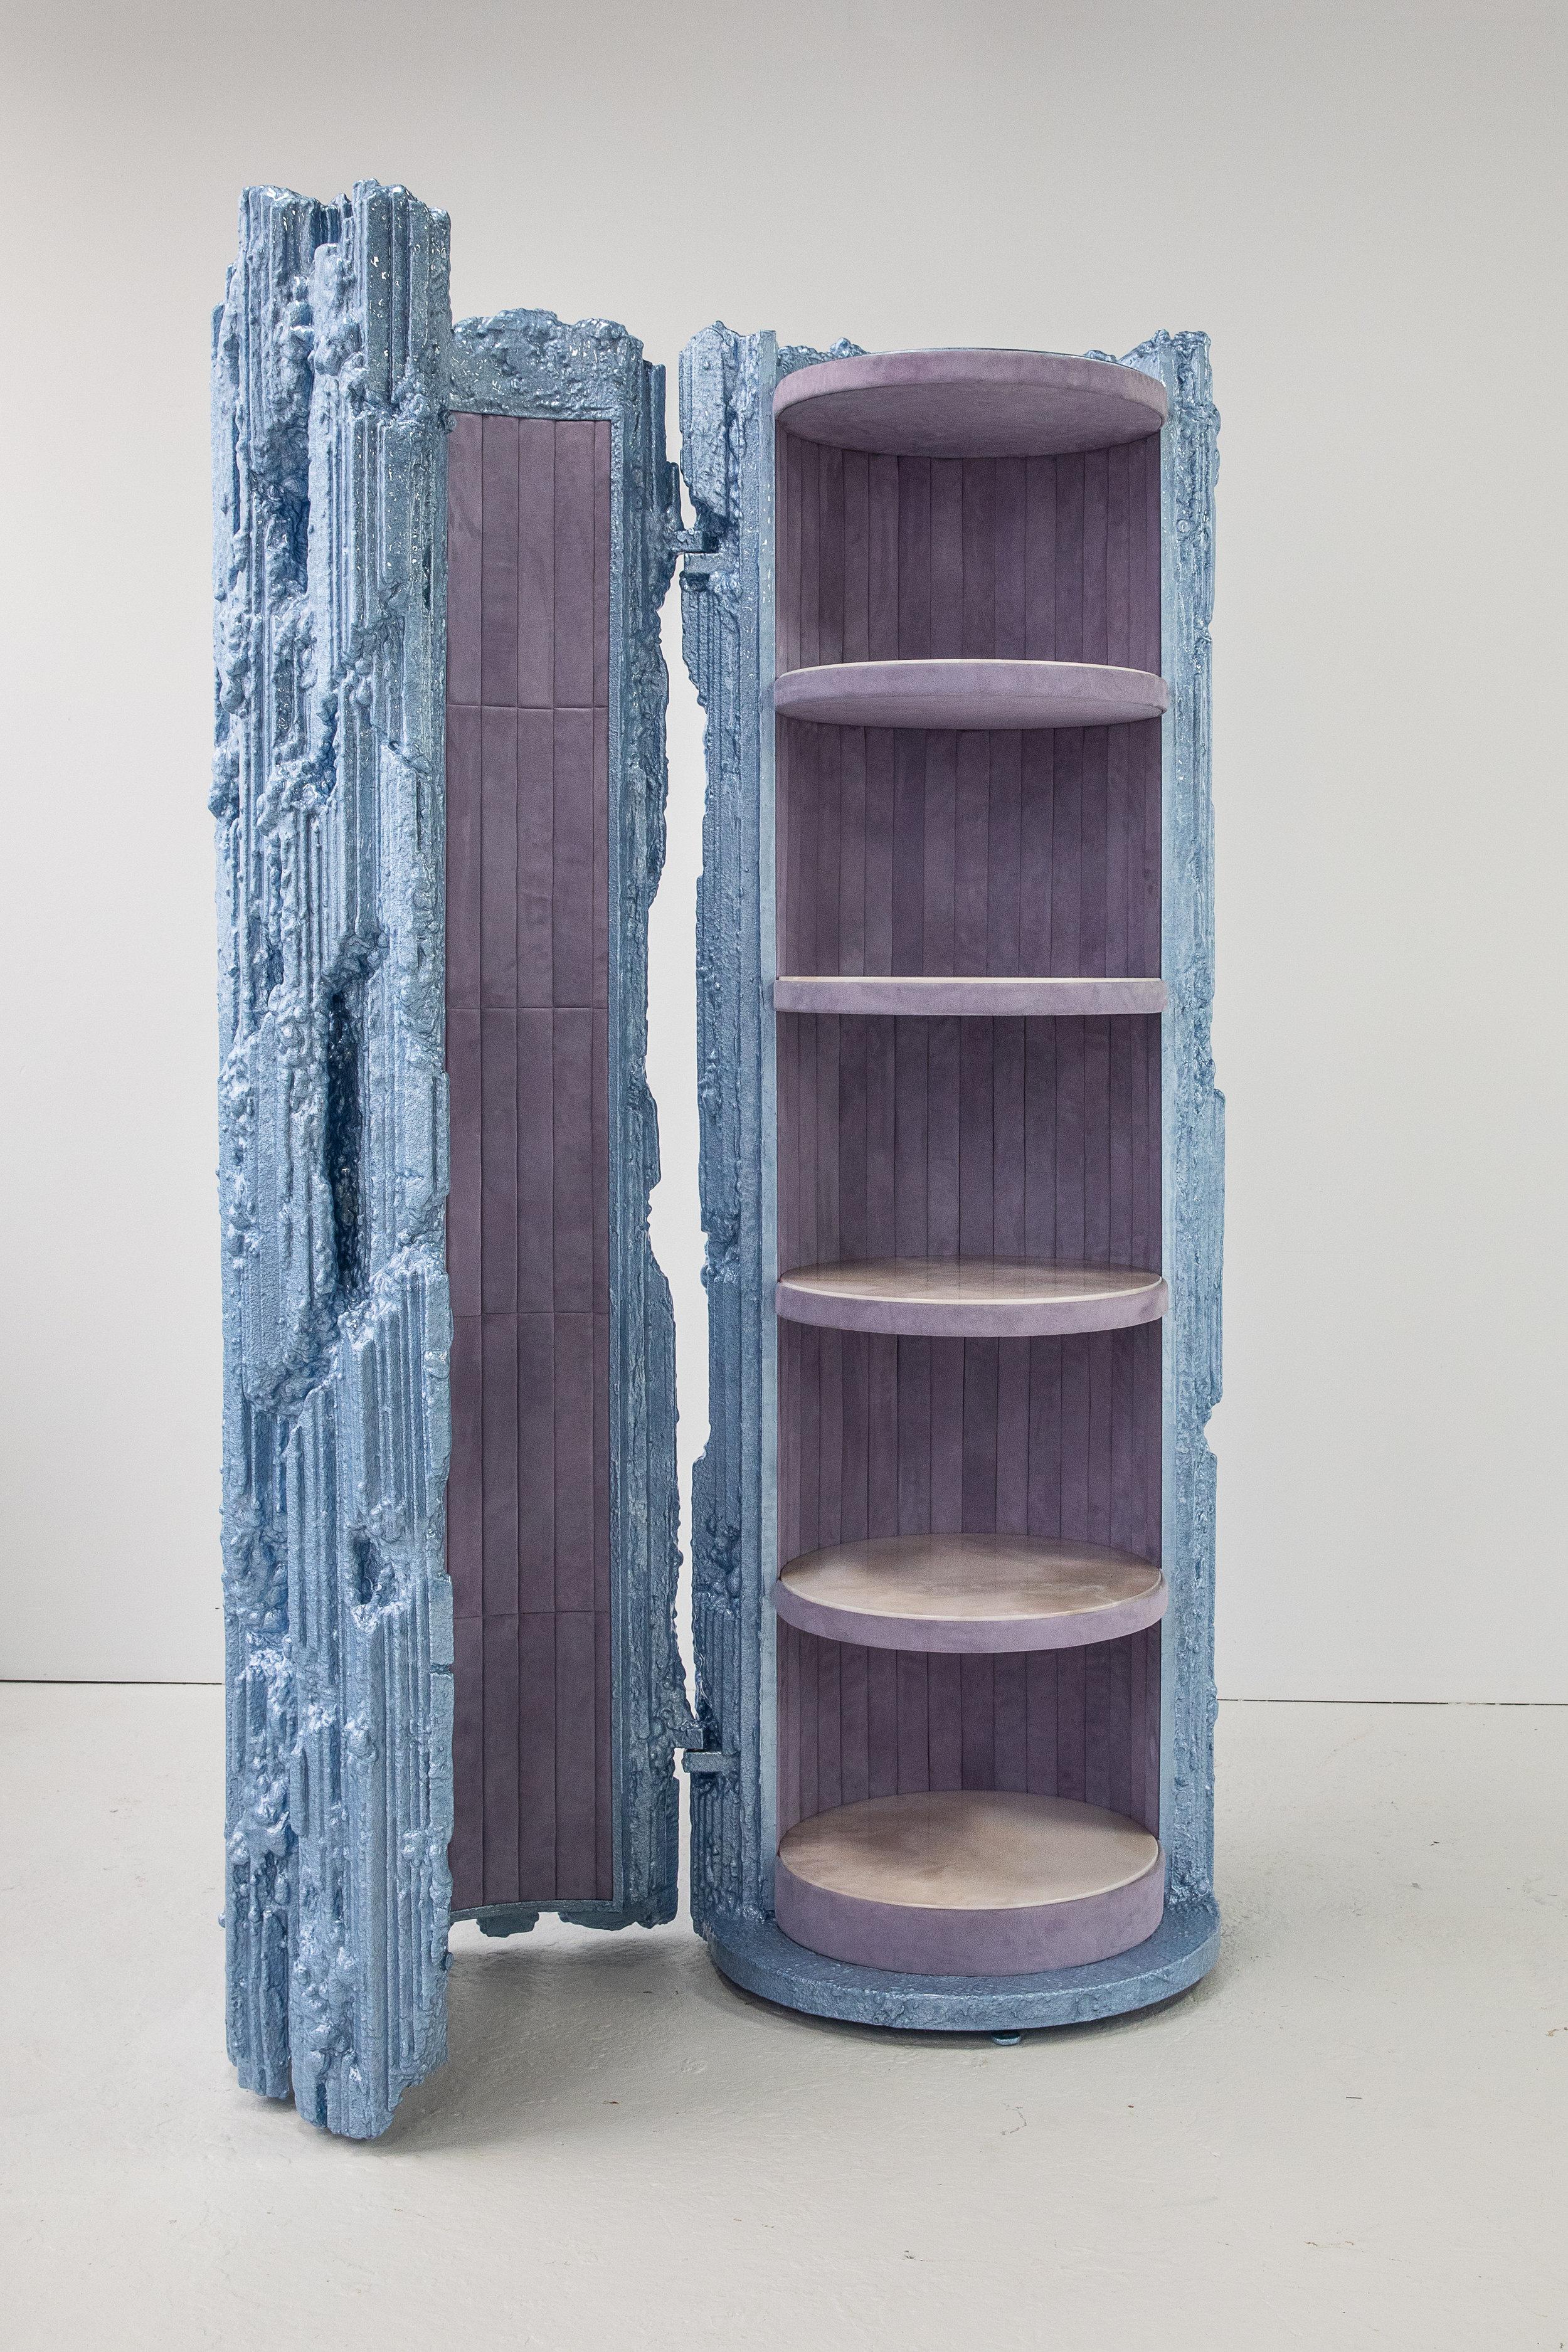 Chris Schanck  -  Cyro , 2018 Steel, aluminum, polystyrene, polyurea, resin, suede and onyx 90h x 32w x 32l inches